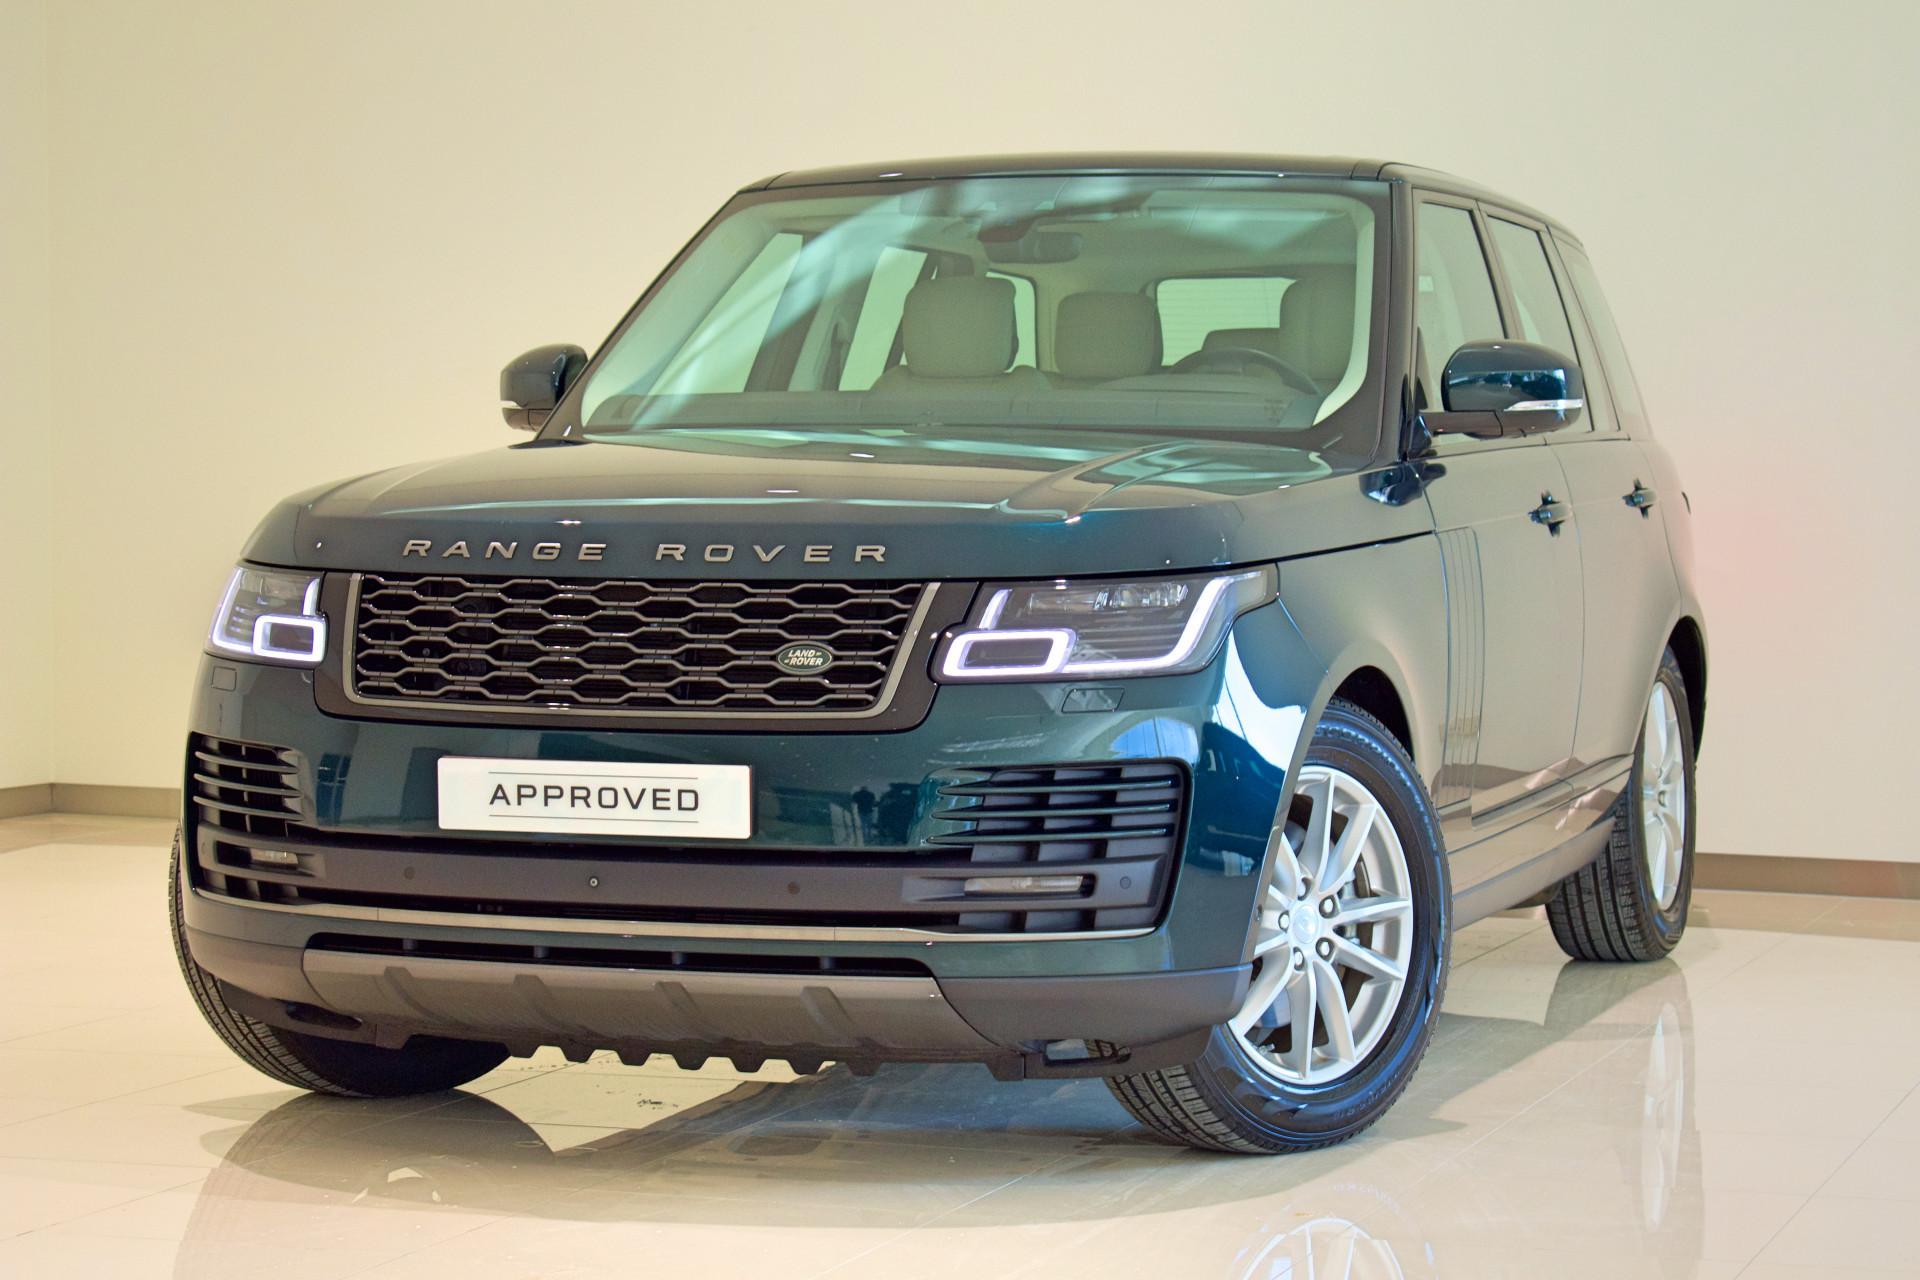 Land Rover Range Rover 3.0 TDV6 HSE - Afbeelding 1